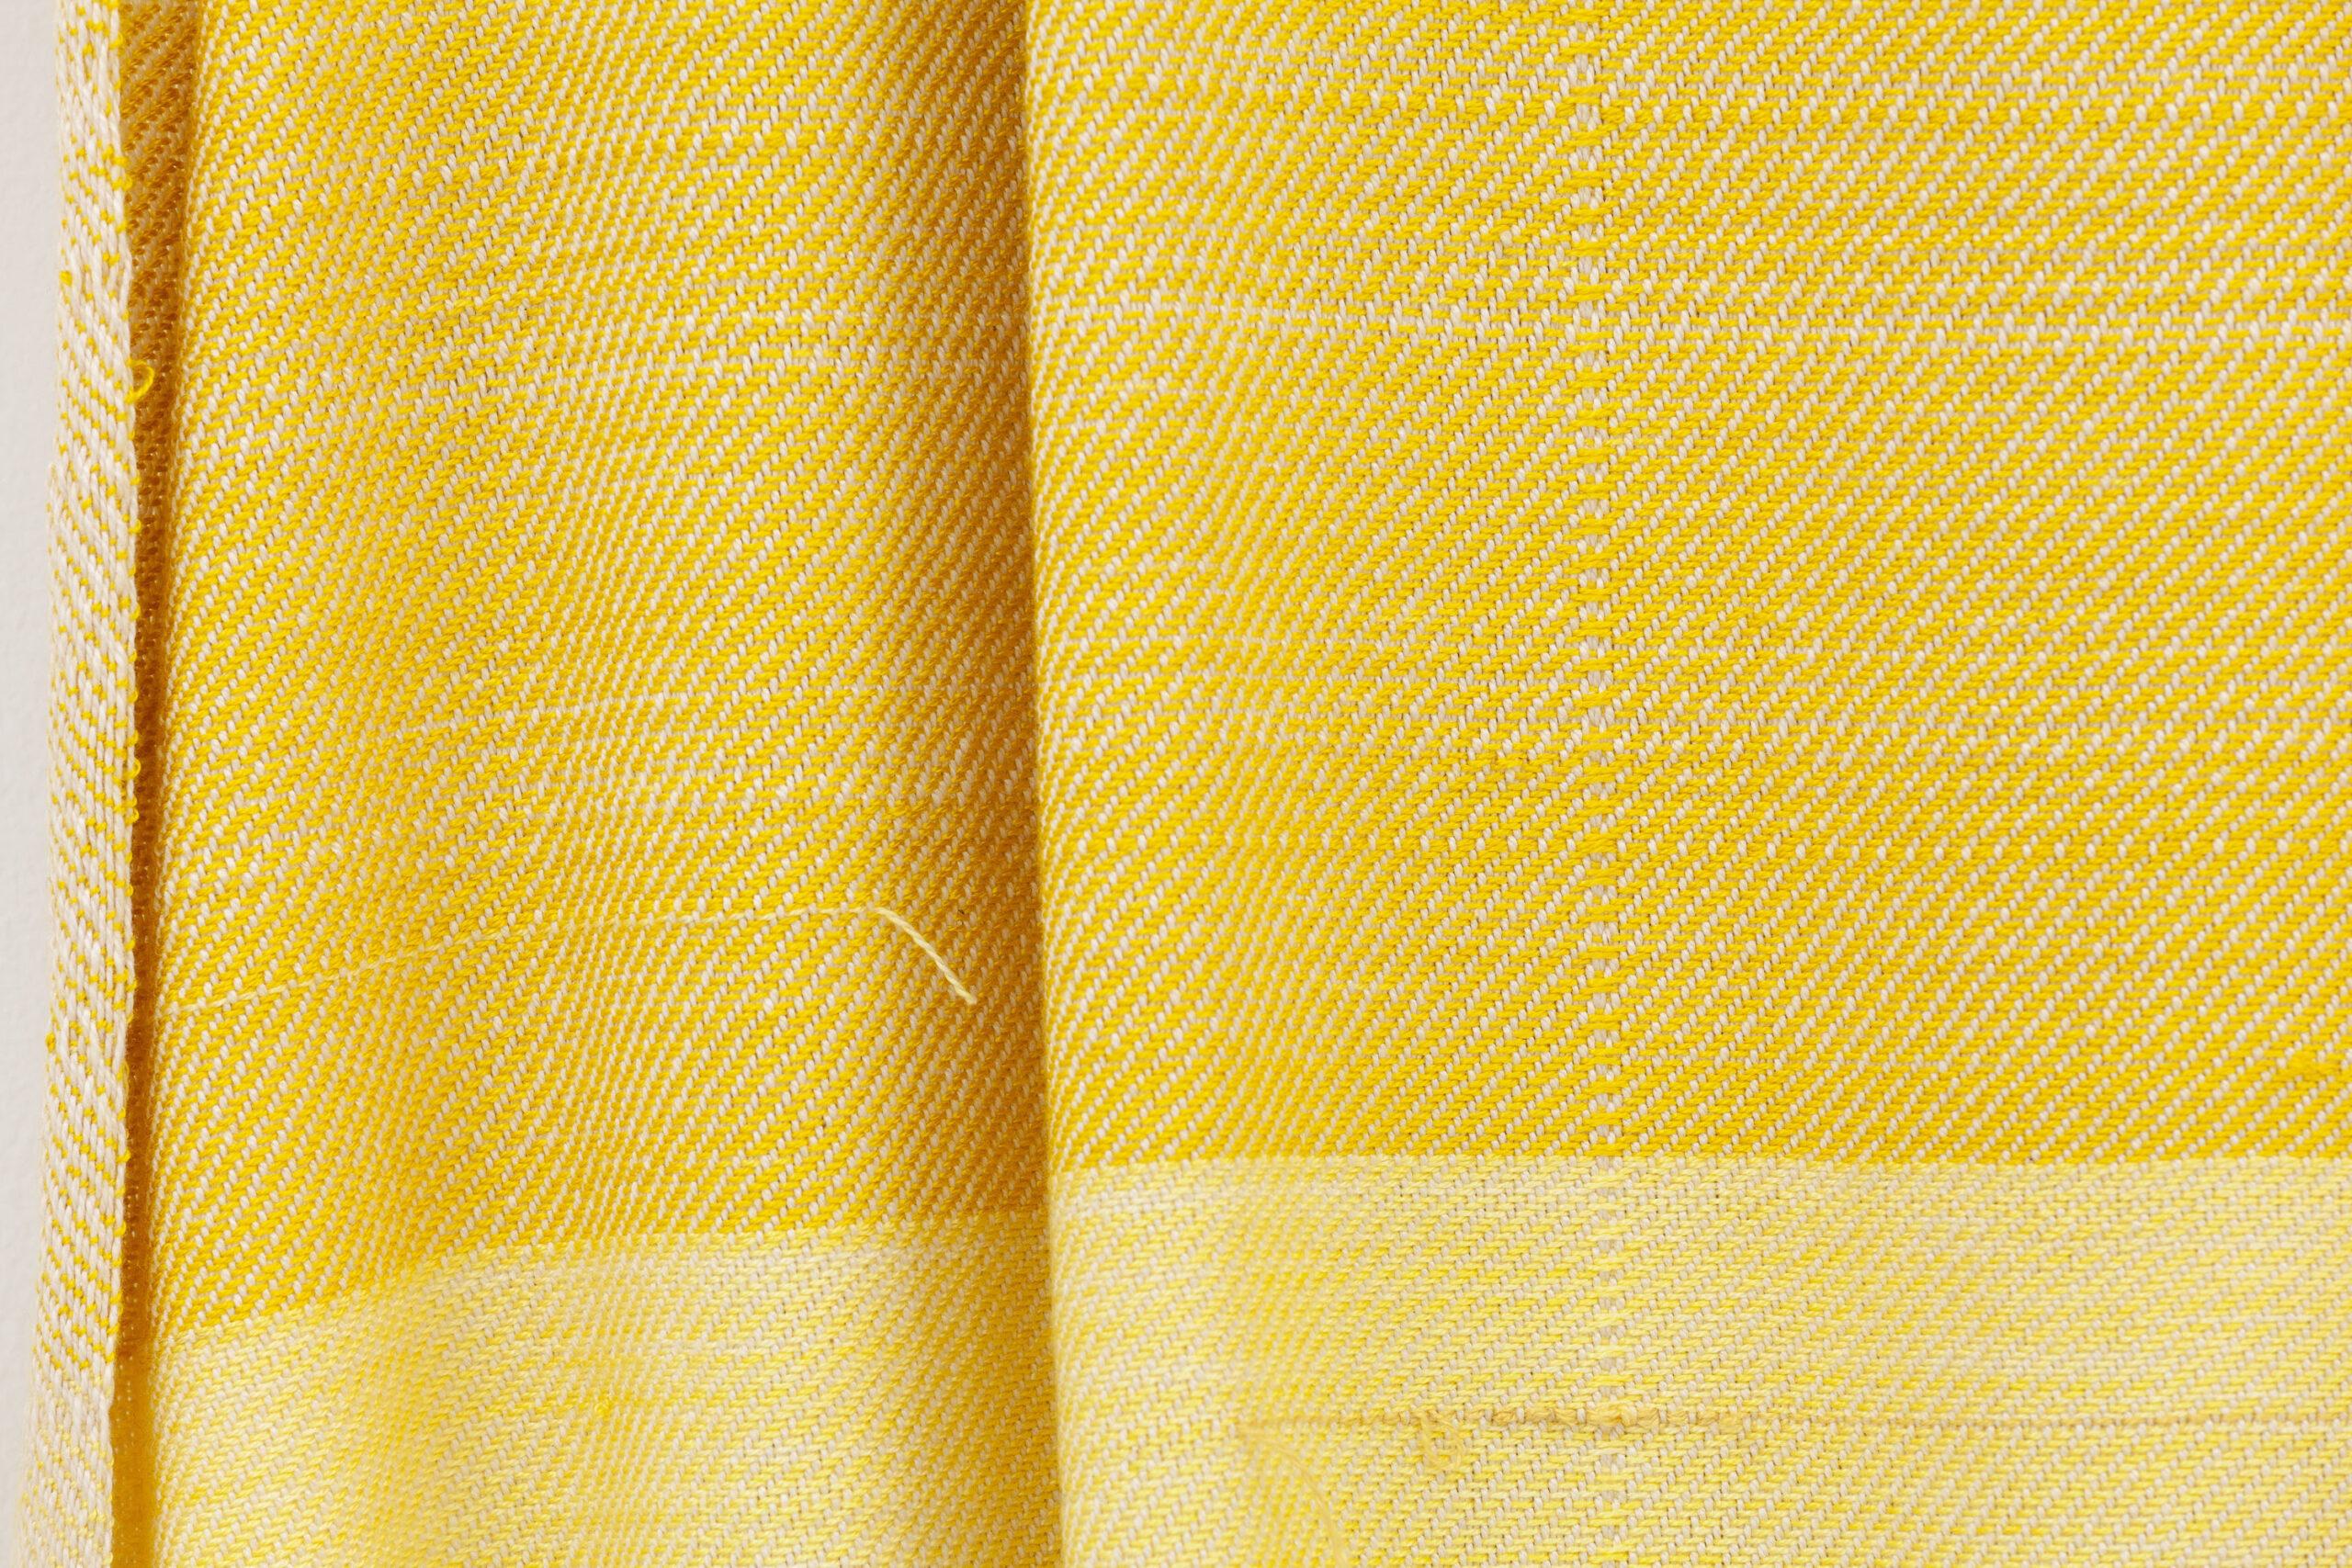 Frances Trombly, Weaving (Artemisia, Weld) (detail), 2020